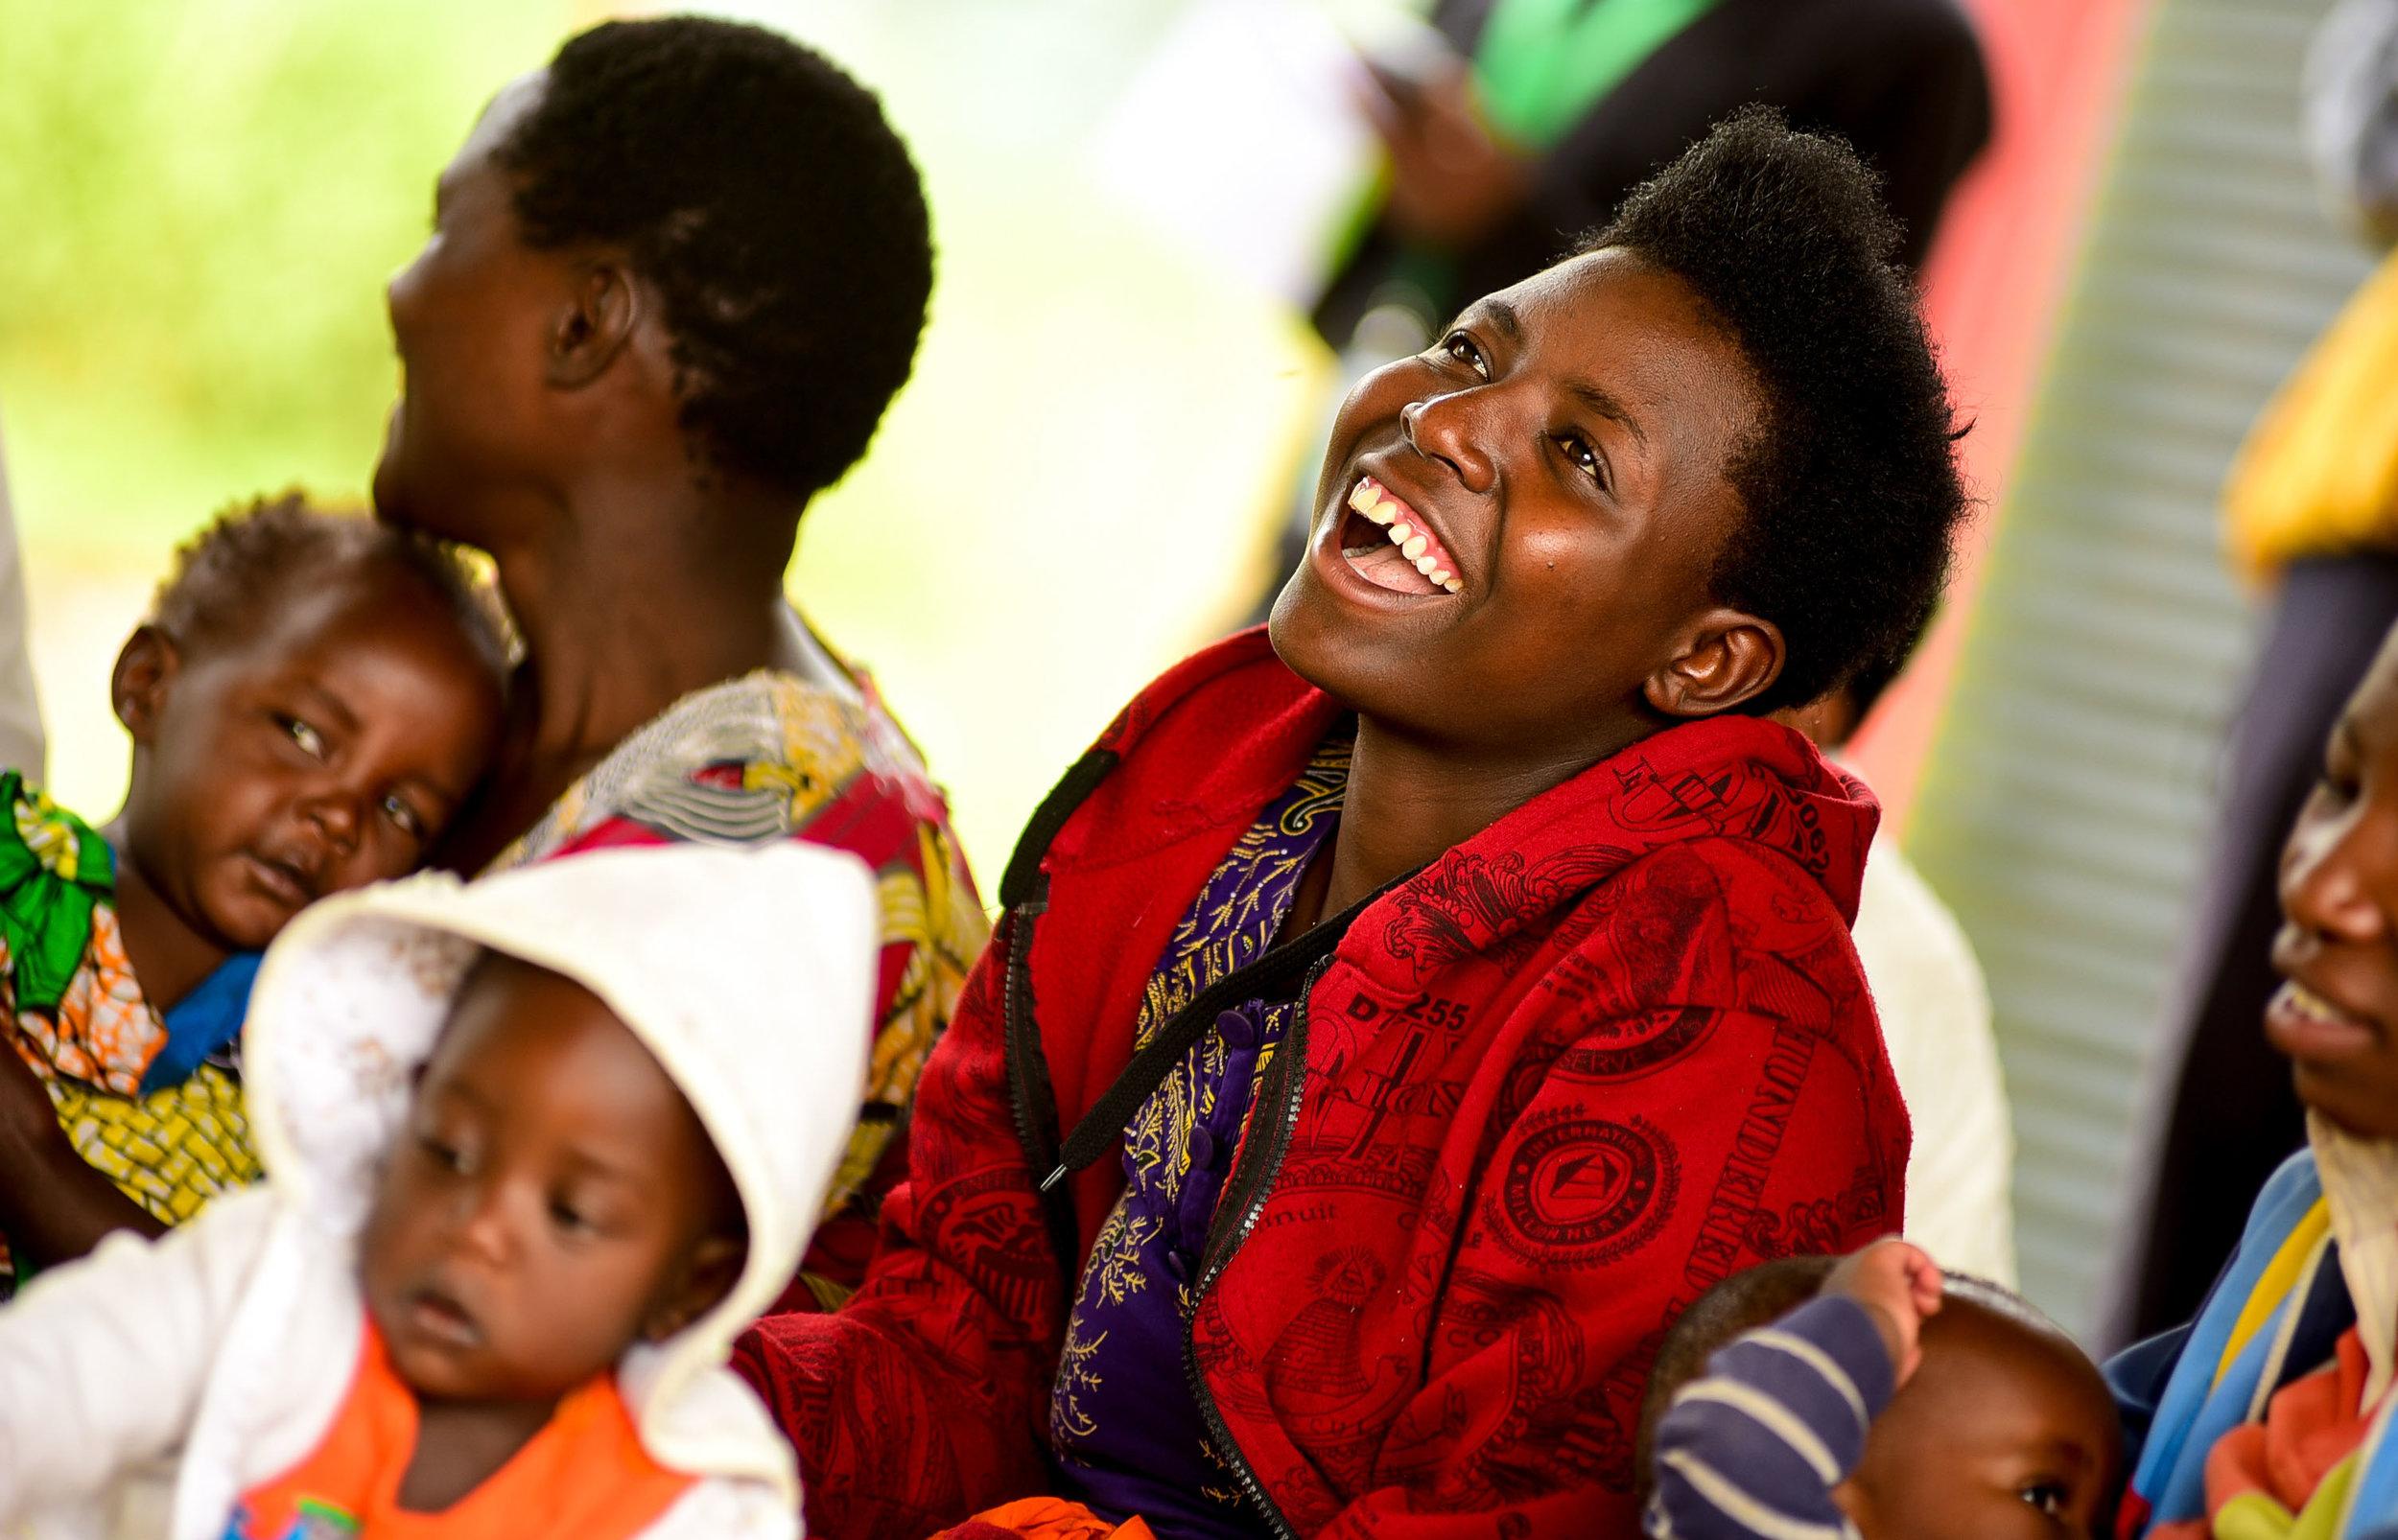 Nyiramariza Lawrence aseka igihe yari yitabiriye amahugurwa ku isuku yabereye ku kigo nderabuzima cya Musanze muri Mutarama 23, 2018.